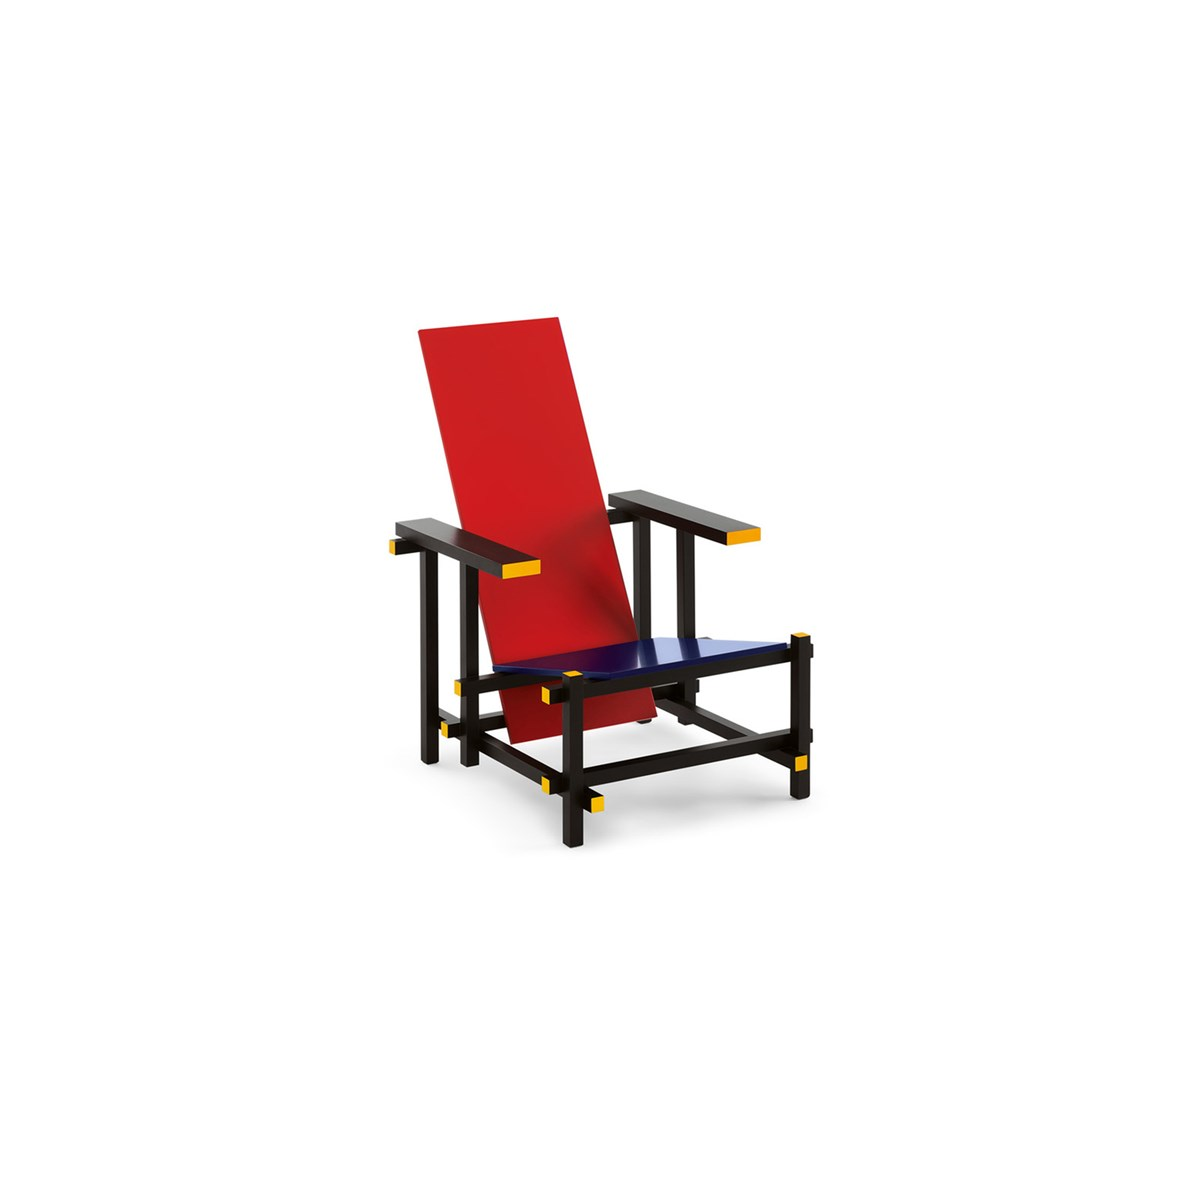 Cassina-Gerrit-Thomas-Rietveld-Red-Blue-Armchair-Matisse-1